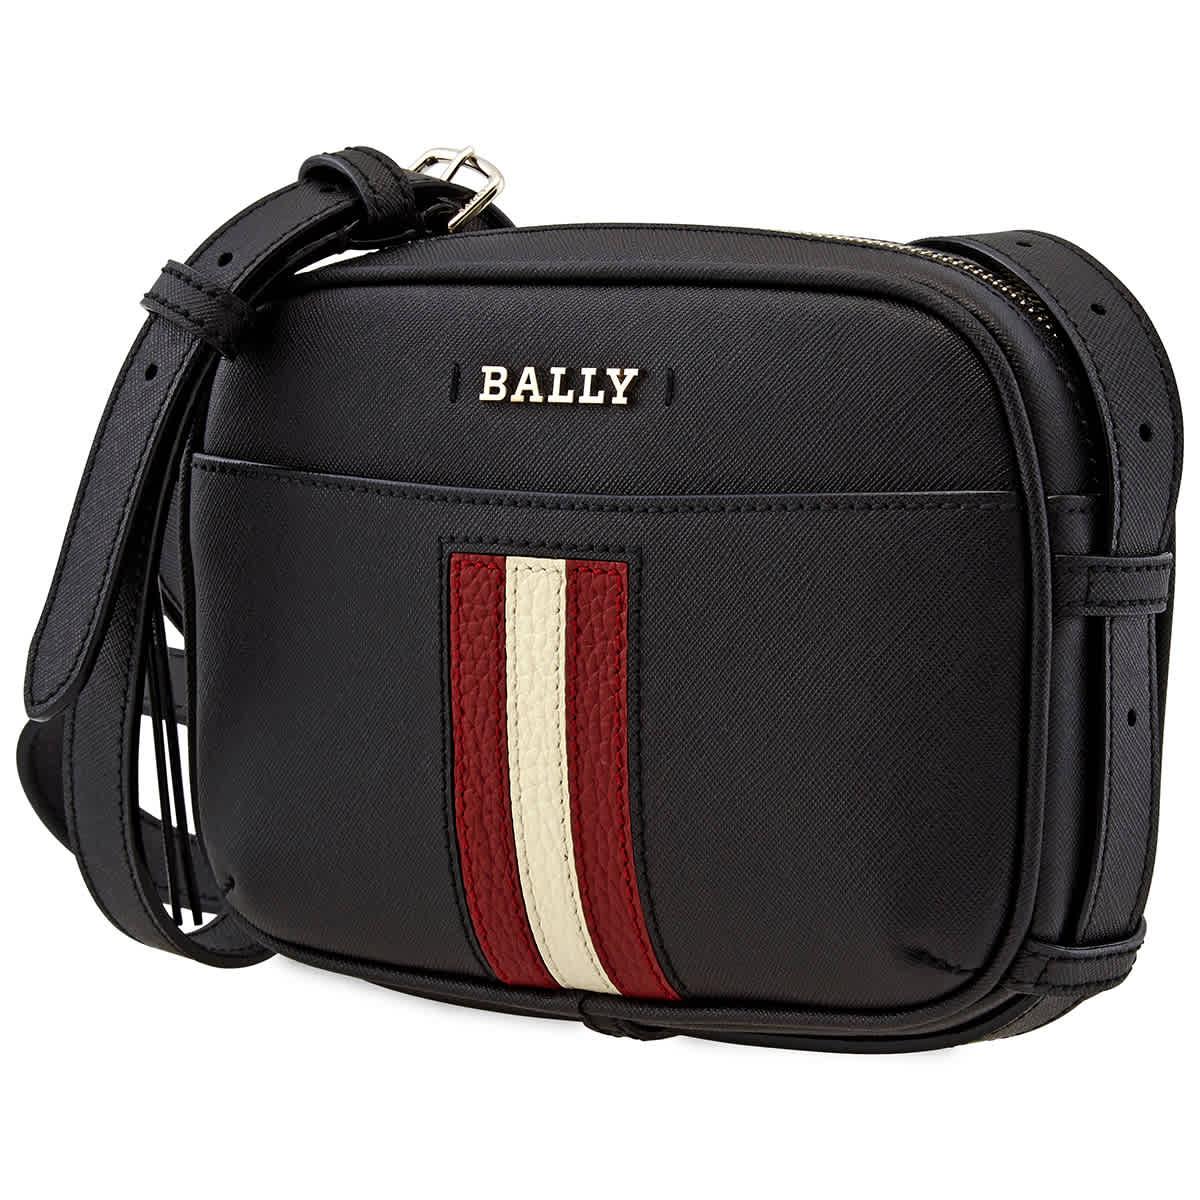 Bally Leathers BLACK SYMO MINI BAG